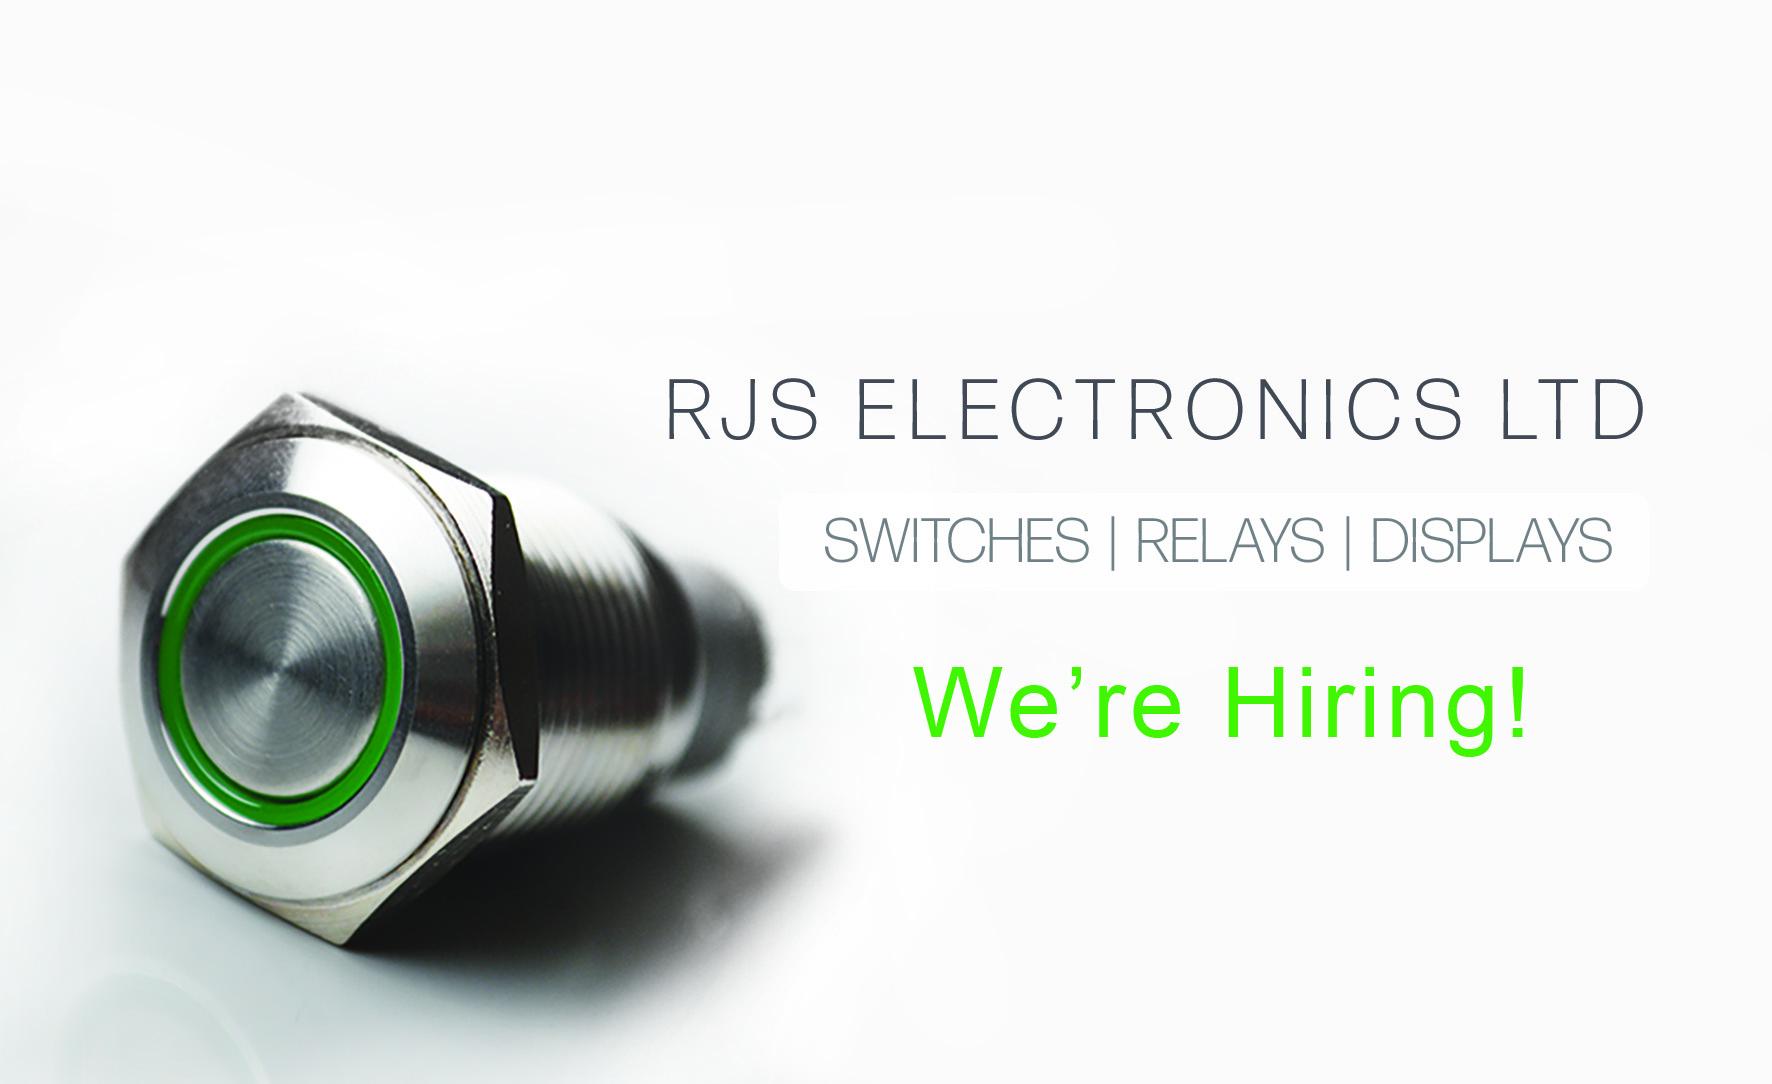 we're hiring! RJS Electronics Ltd, Bedford, Bedford College. Sales Intern, Stores, RJS Electronics Ltd